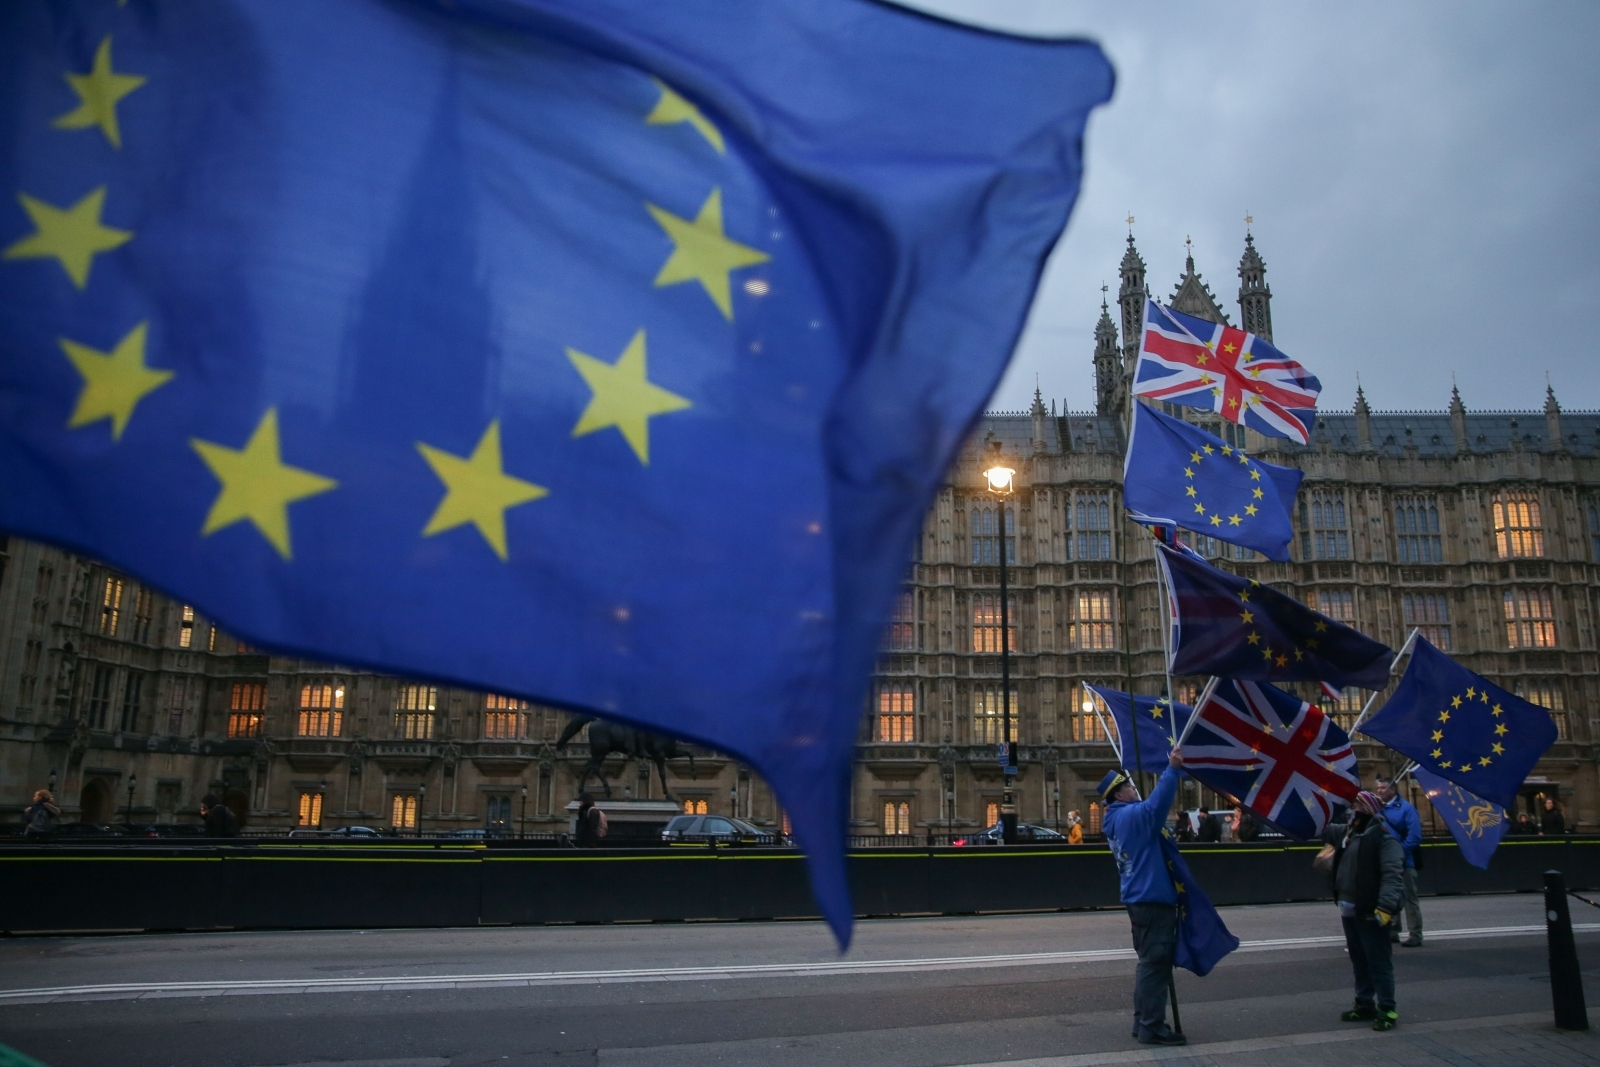 Pro-EU anti-Brexit demonstrators in London